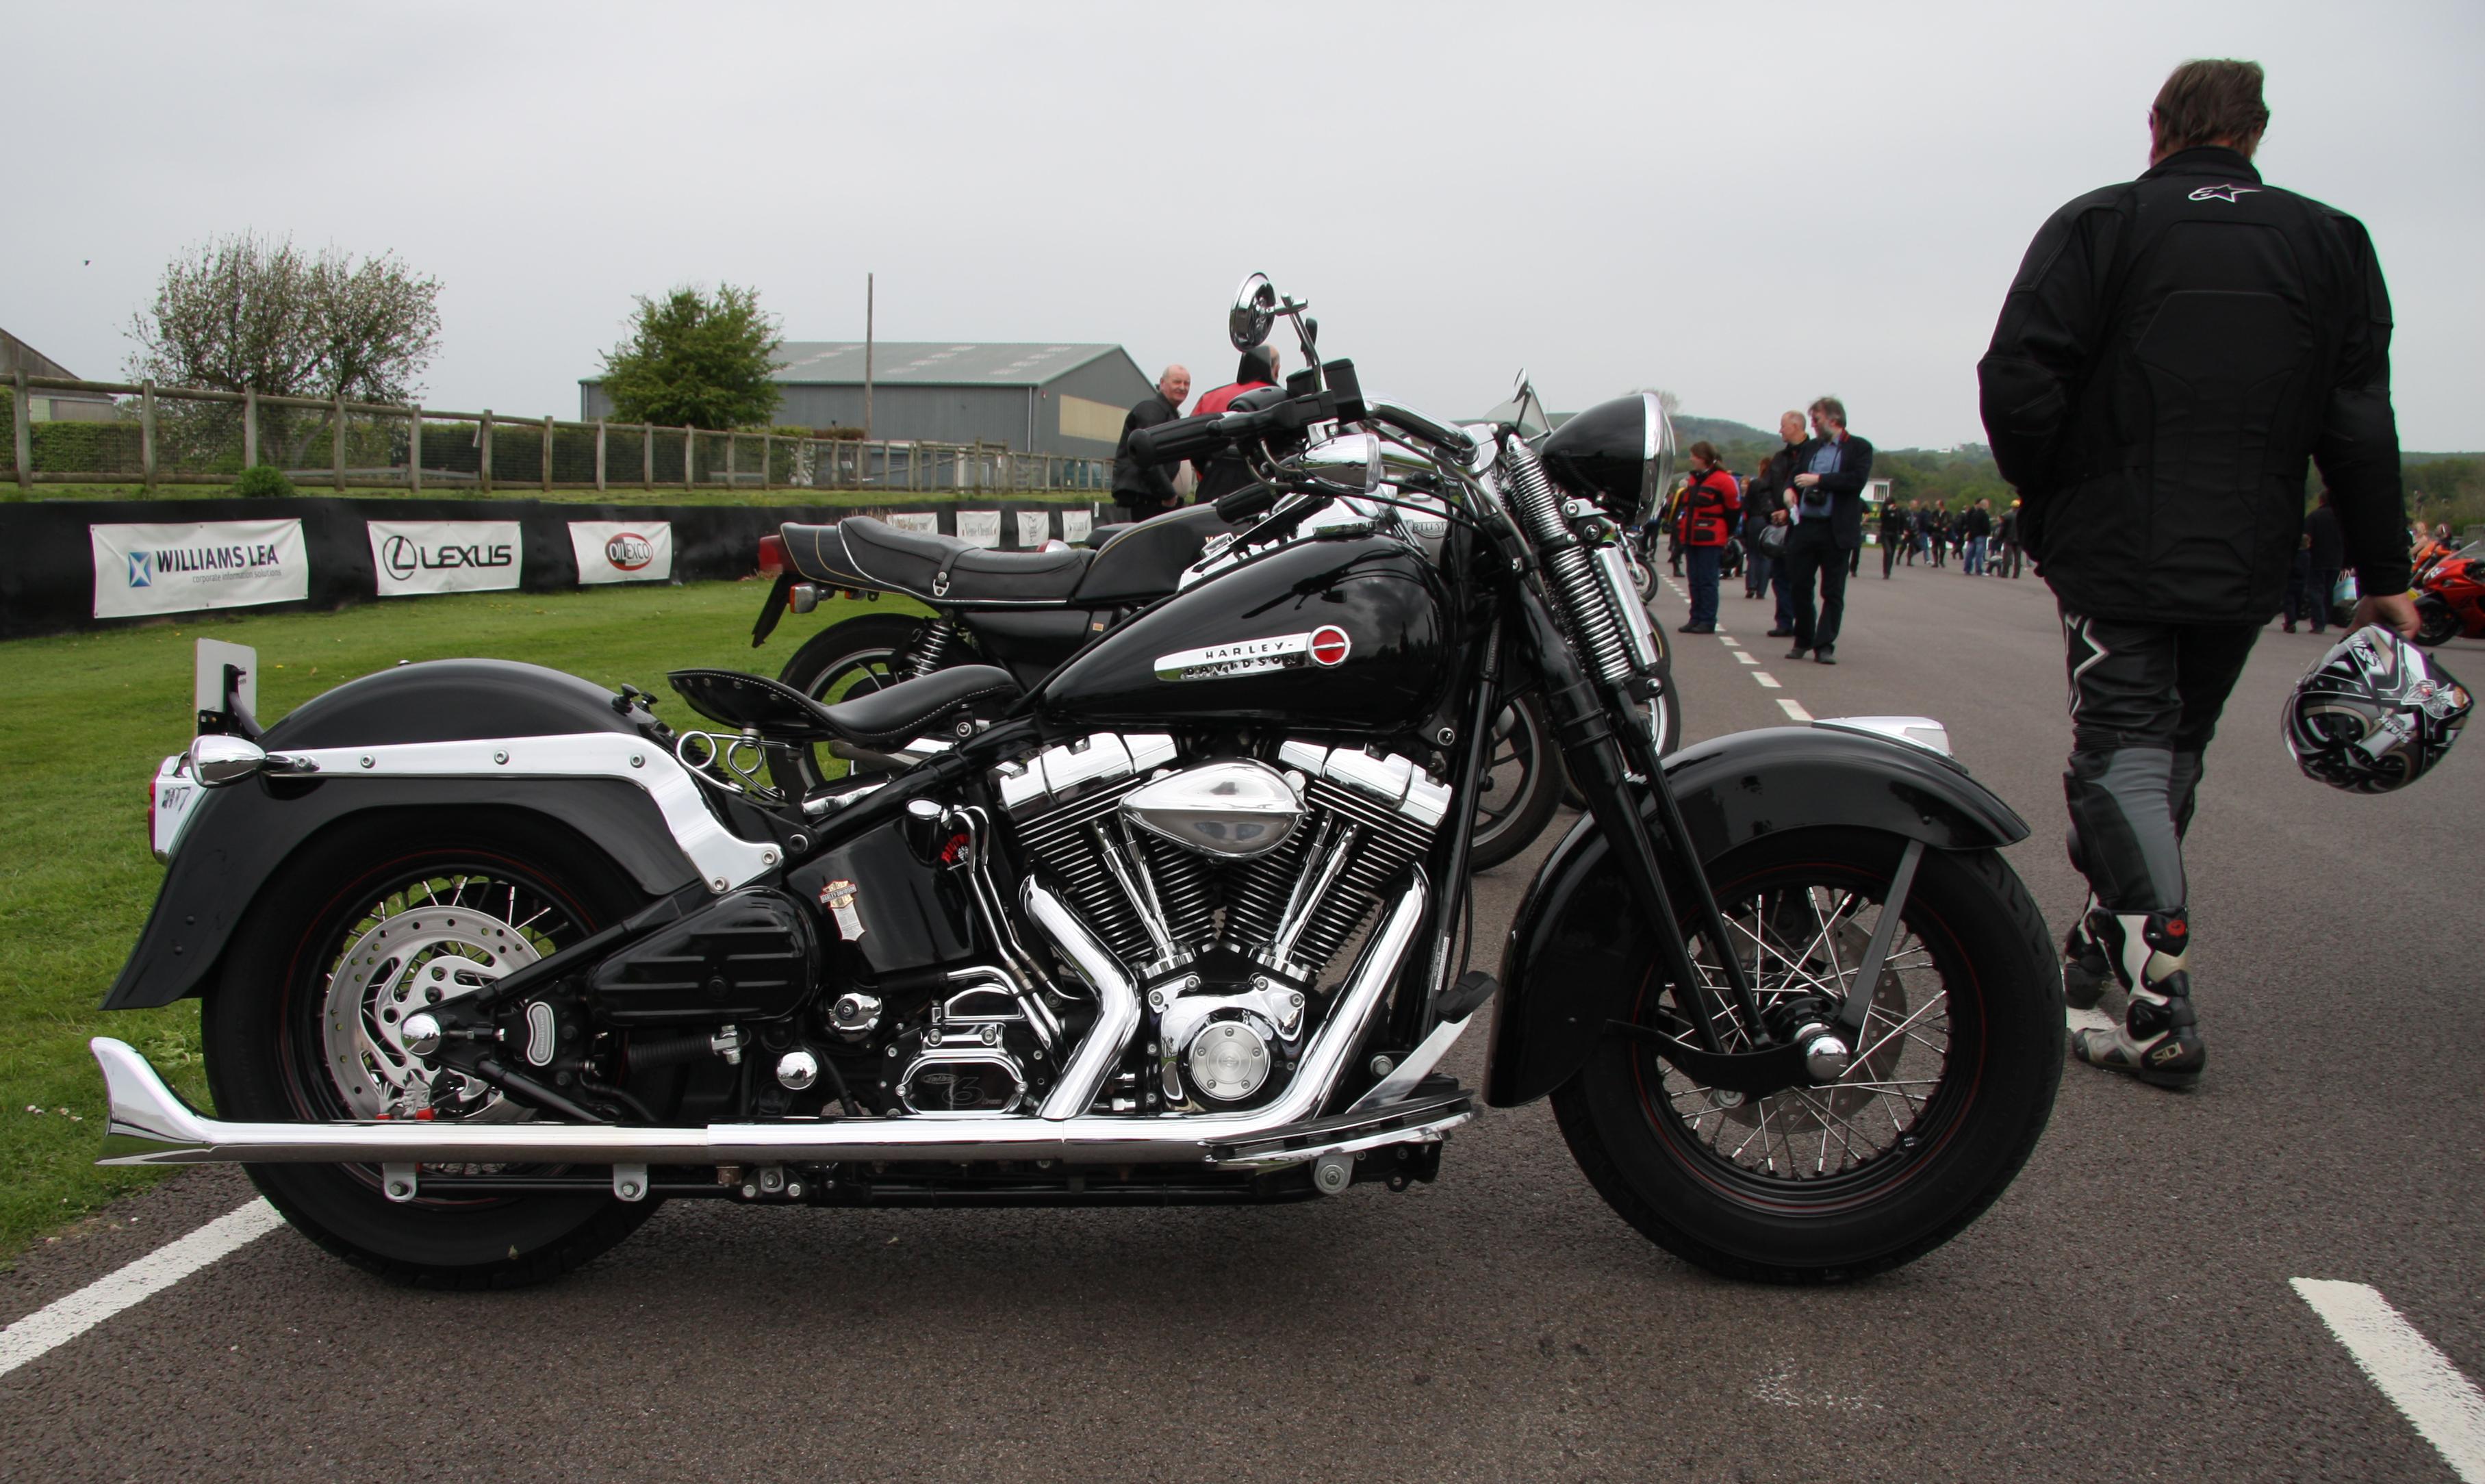 Harley Davidson Q1 warning - Business Insider